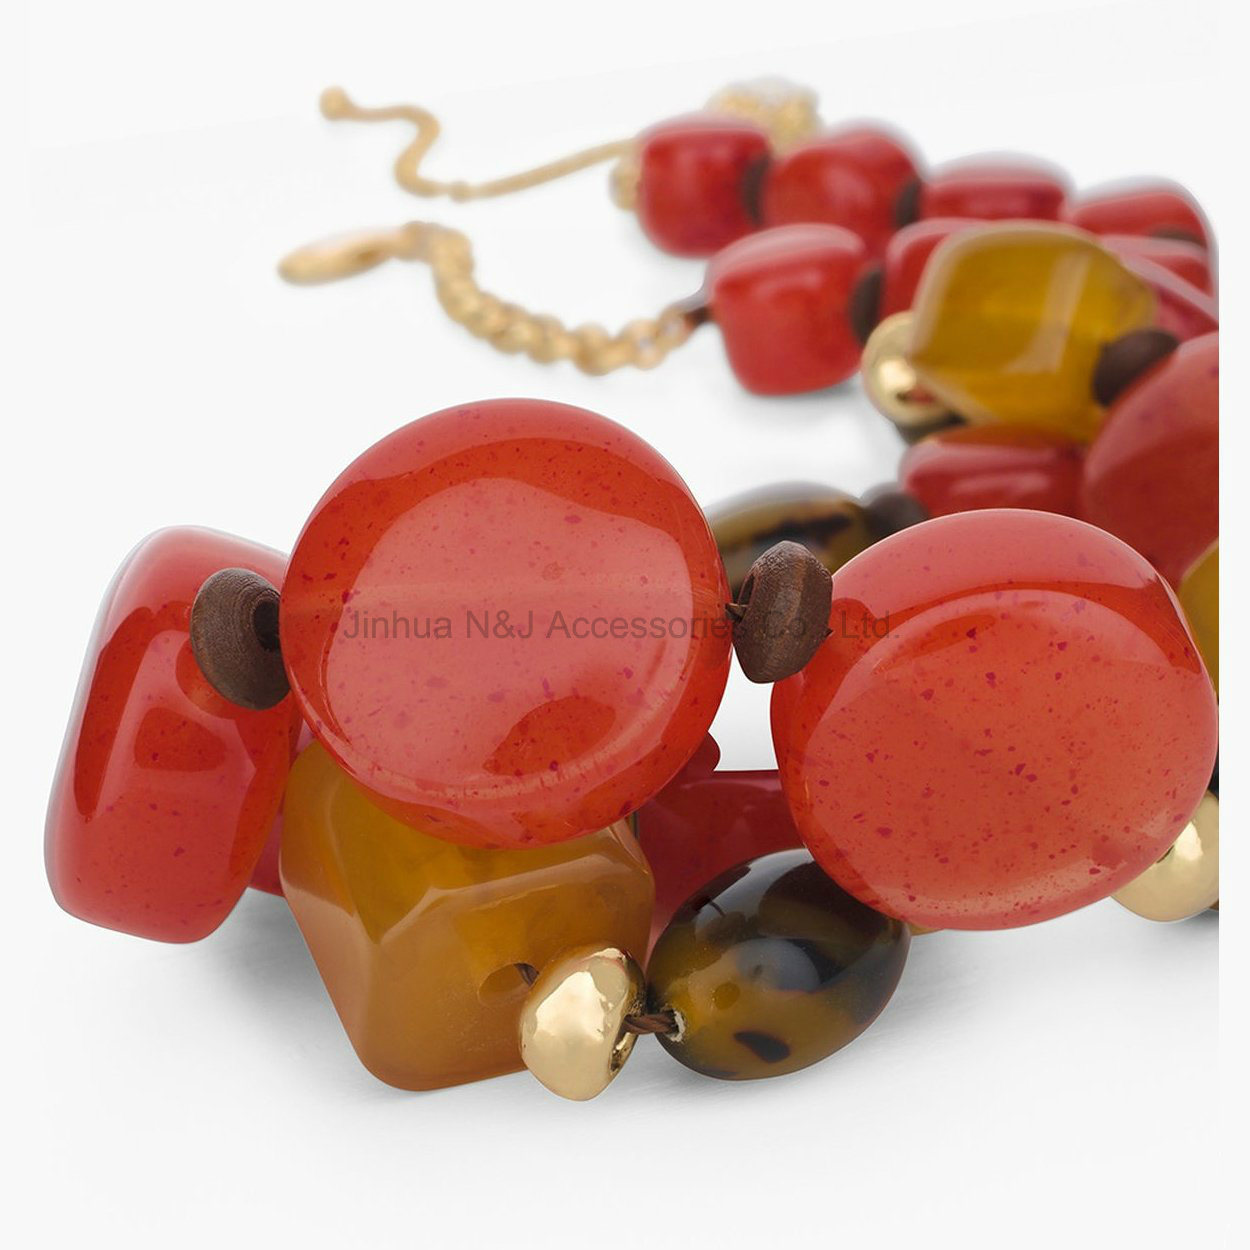 Colourful Beads Choker Vintage Pendants Statement Necklaces & Pendants Long Necklace Women Jewelry